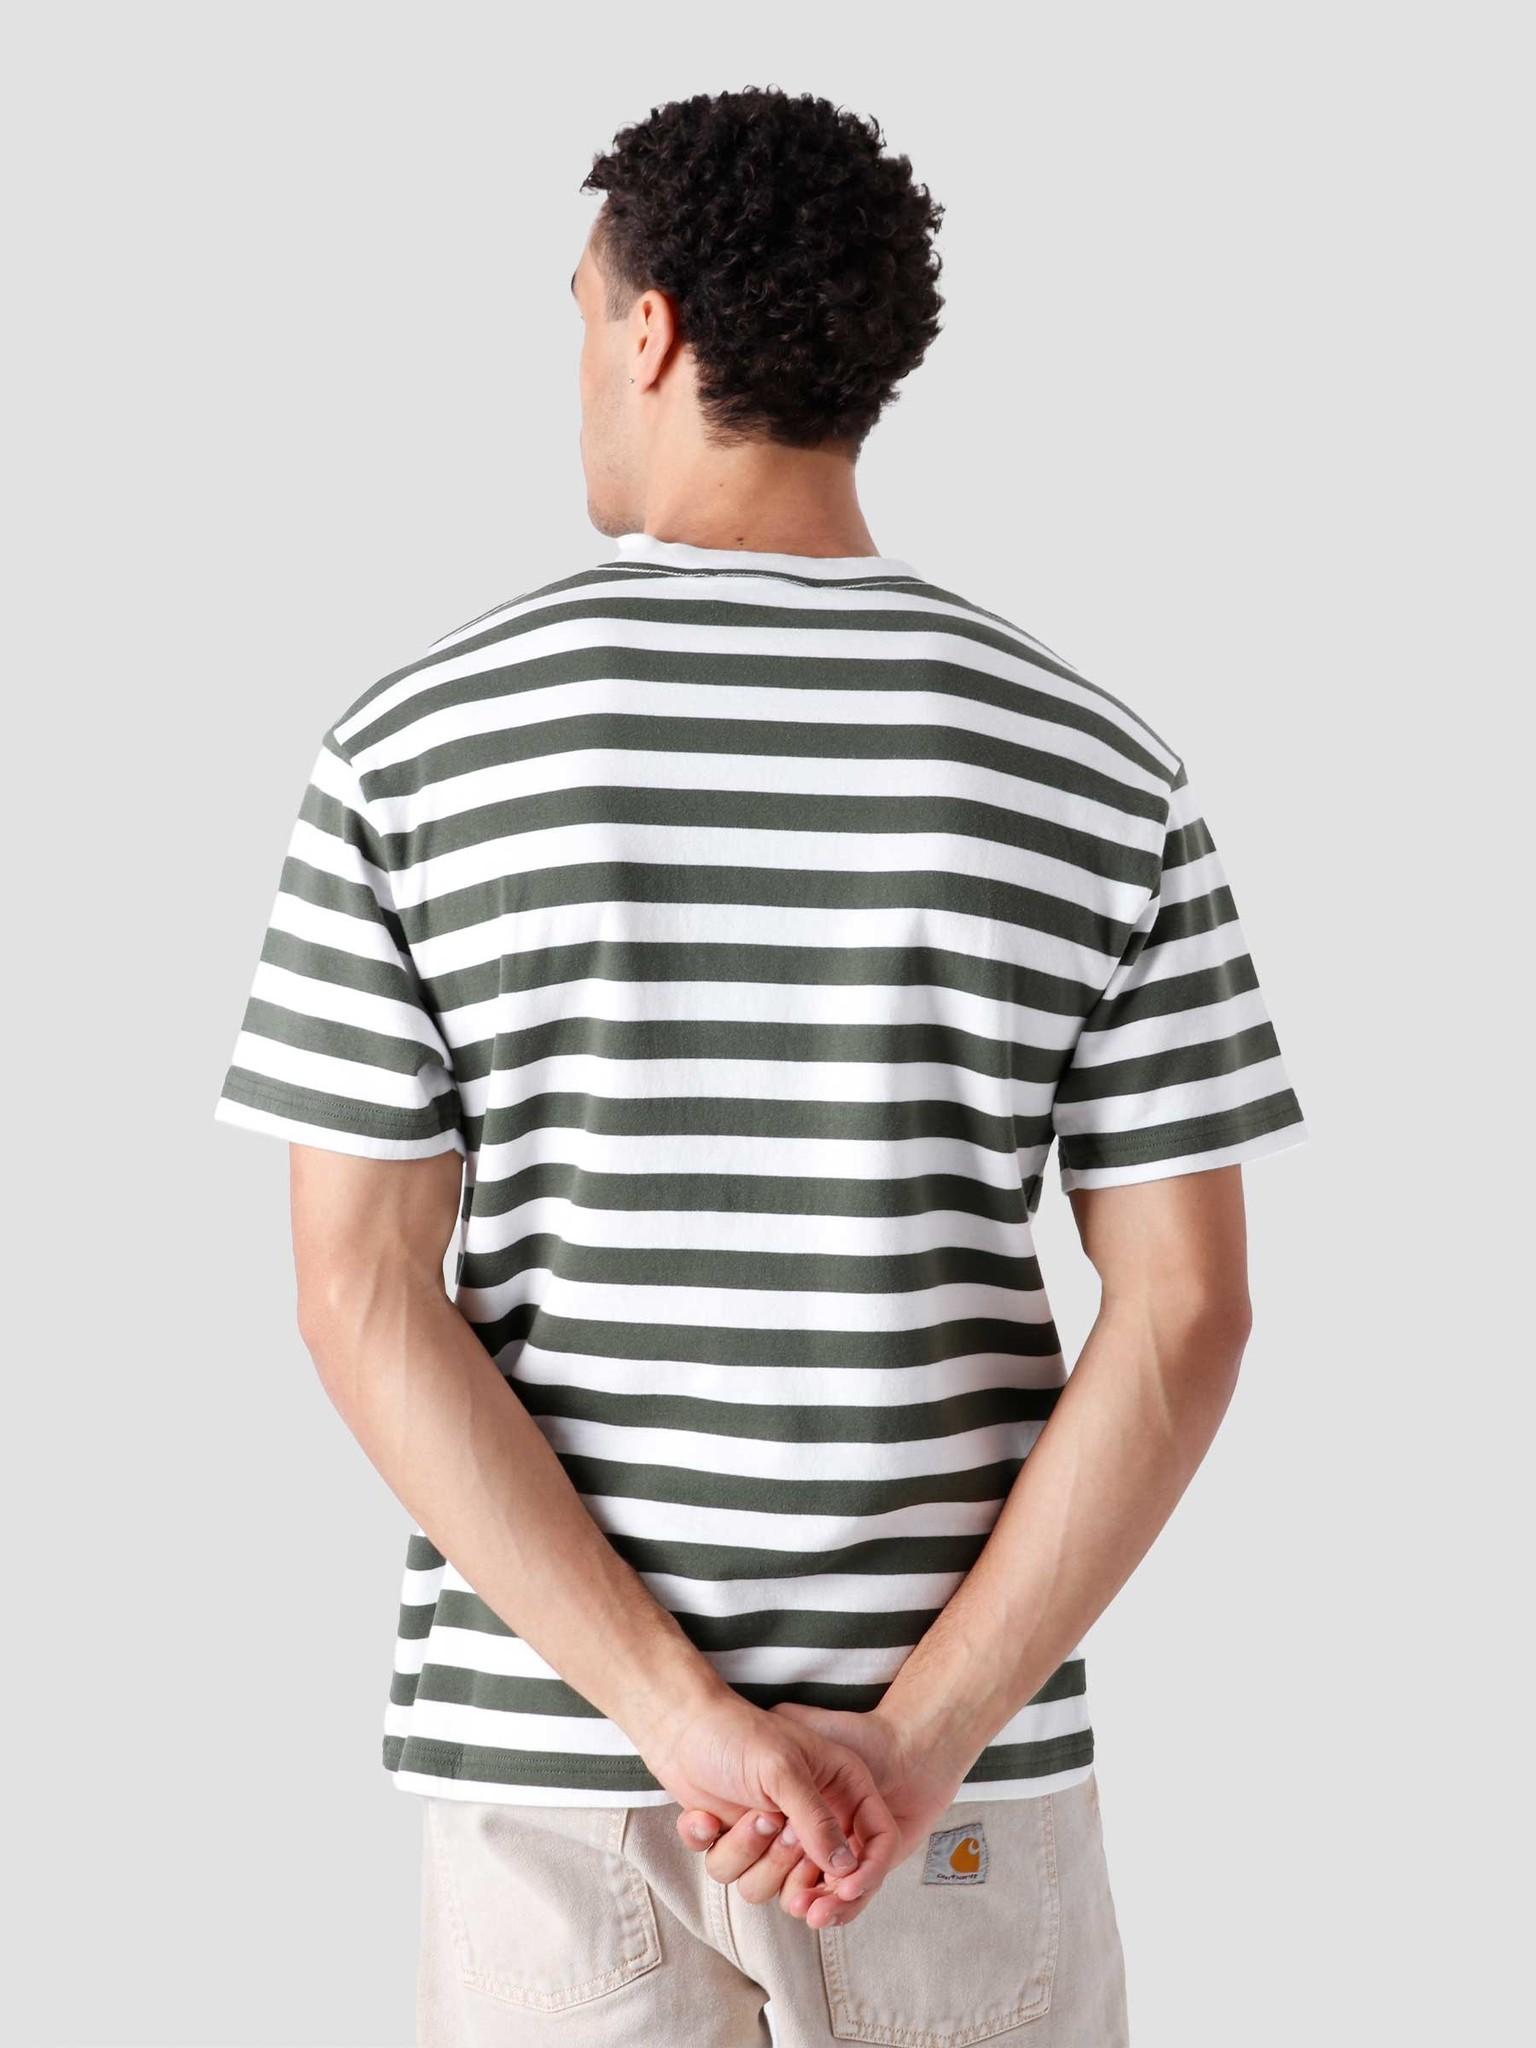 Olaf Hussein Olaf Hussein Stripe Sans T-Shirt White Sage